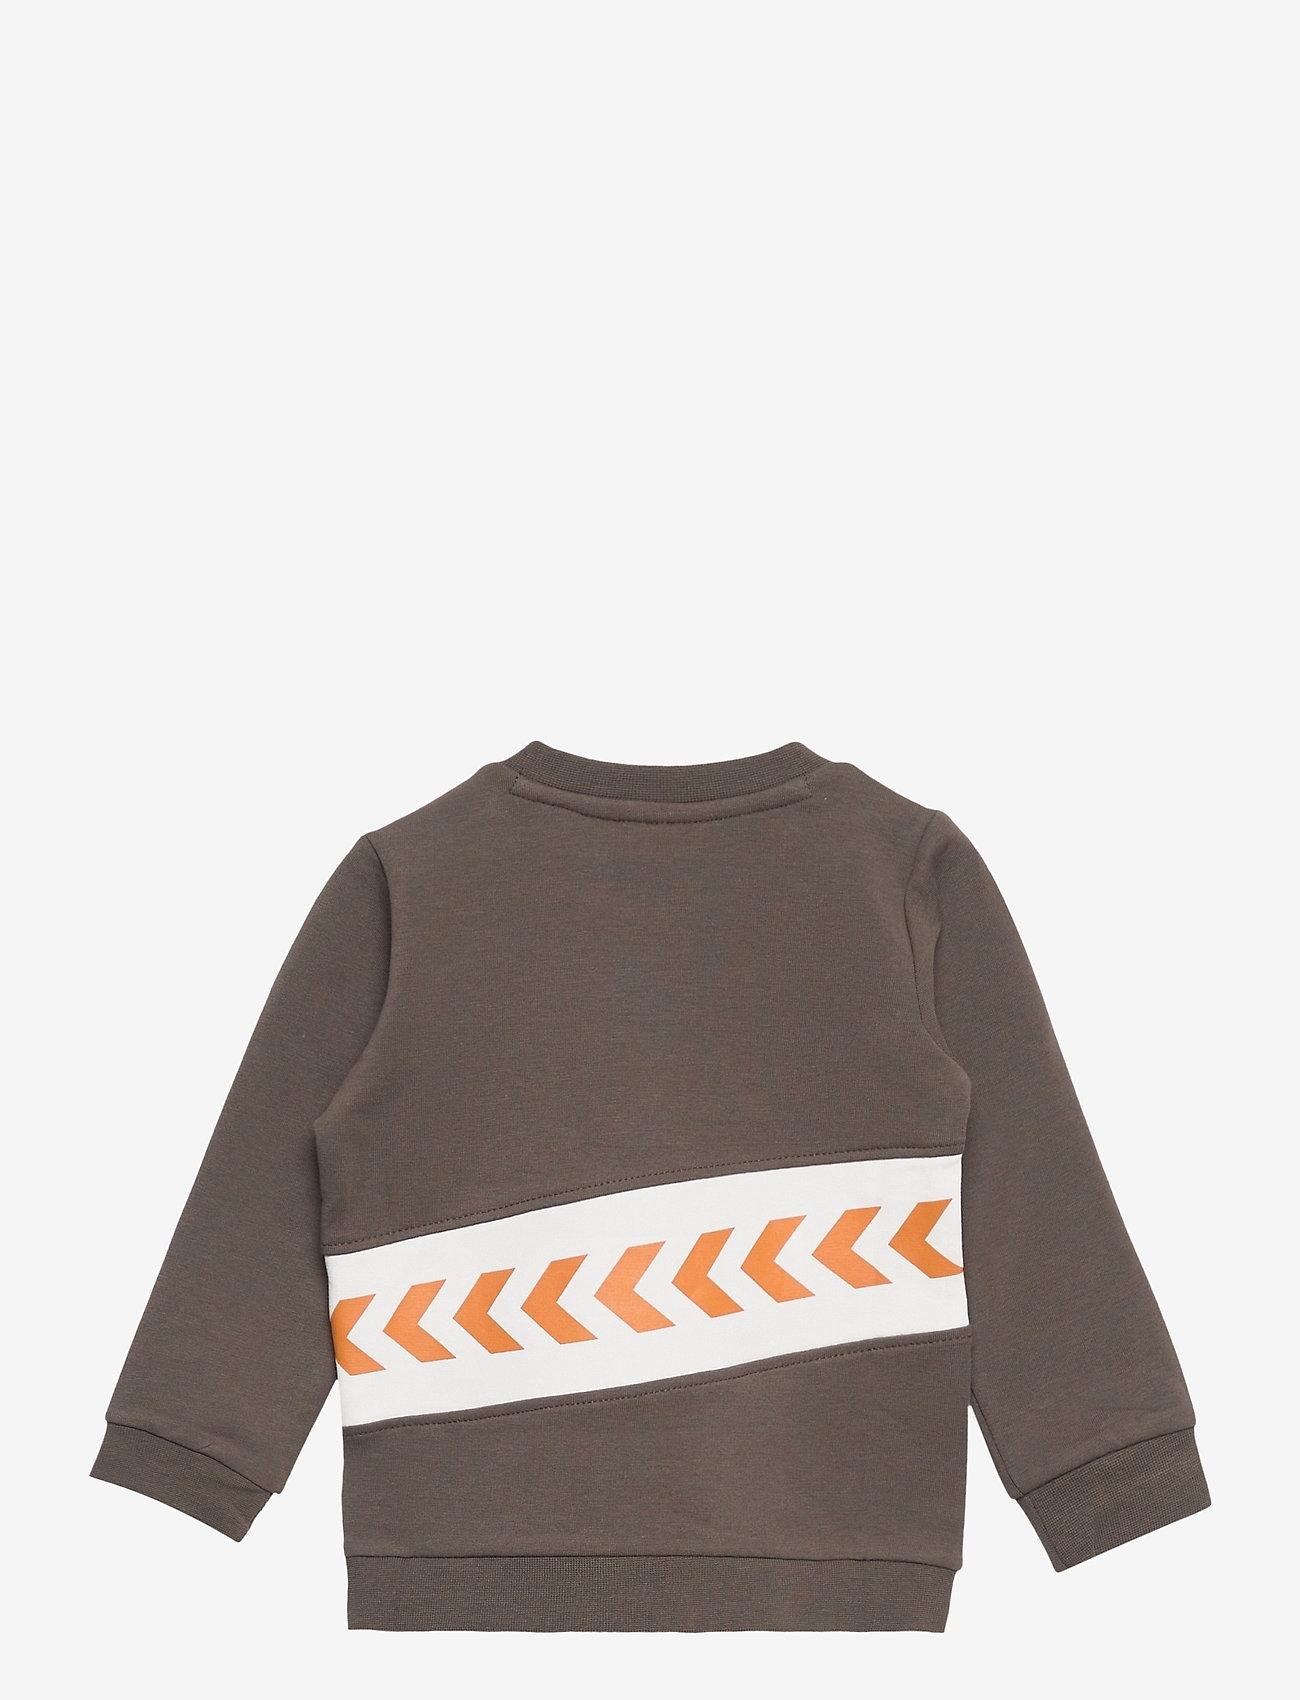 Hummel - hmlCLEMENT SWEAT - sweatshirts - black olive - 1